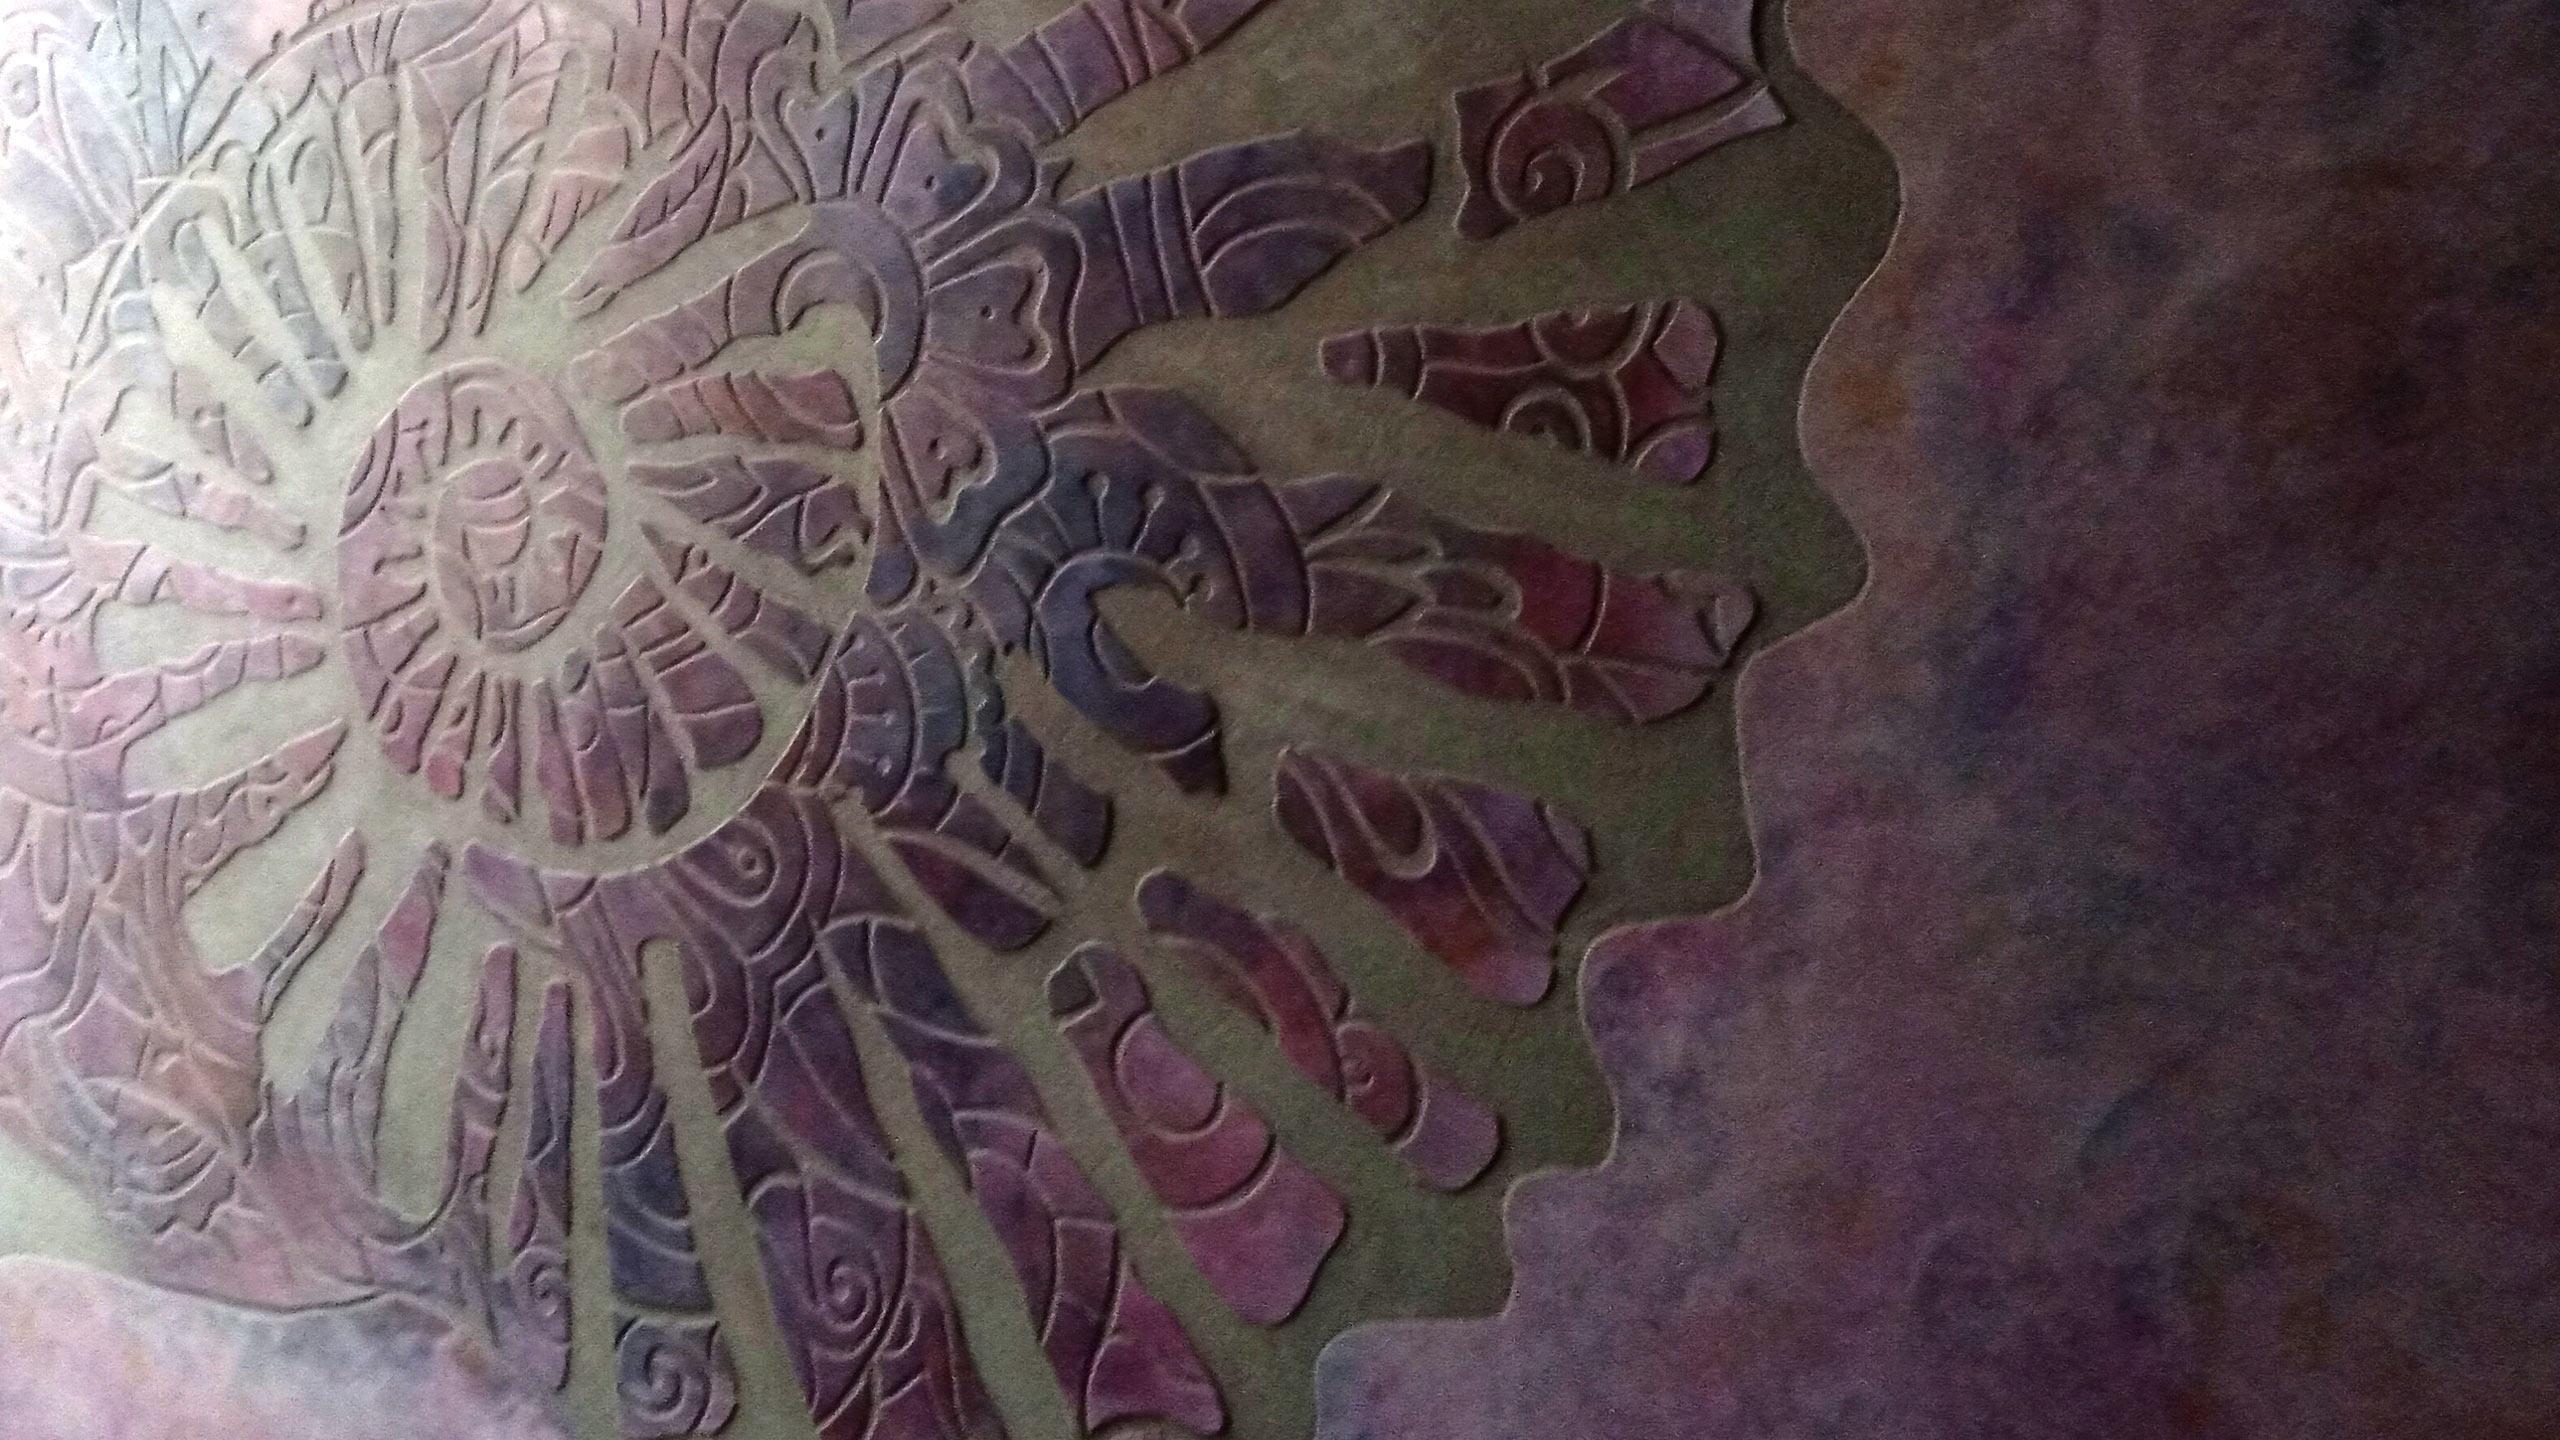 SgraffitoStucco - Doloris Meta Maze, Nautilus shaped design